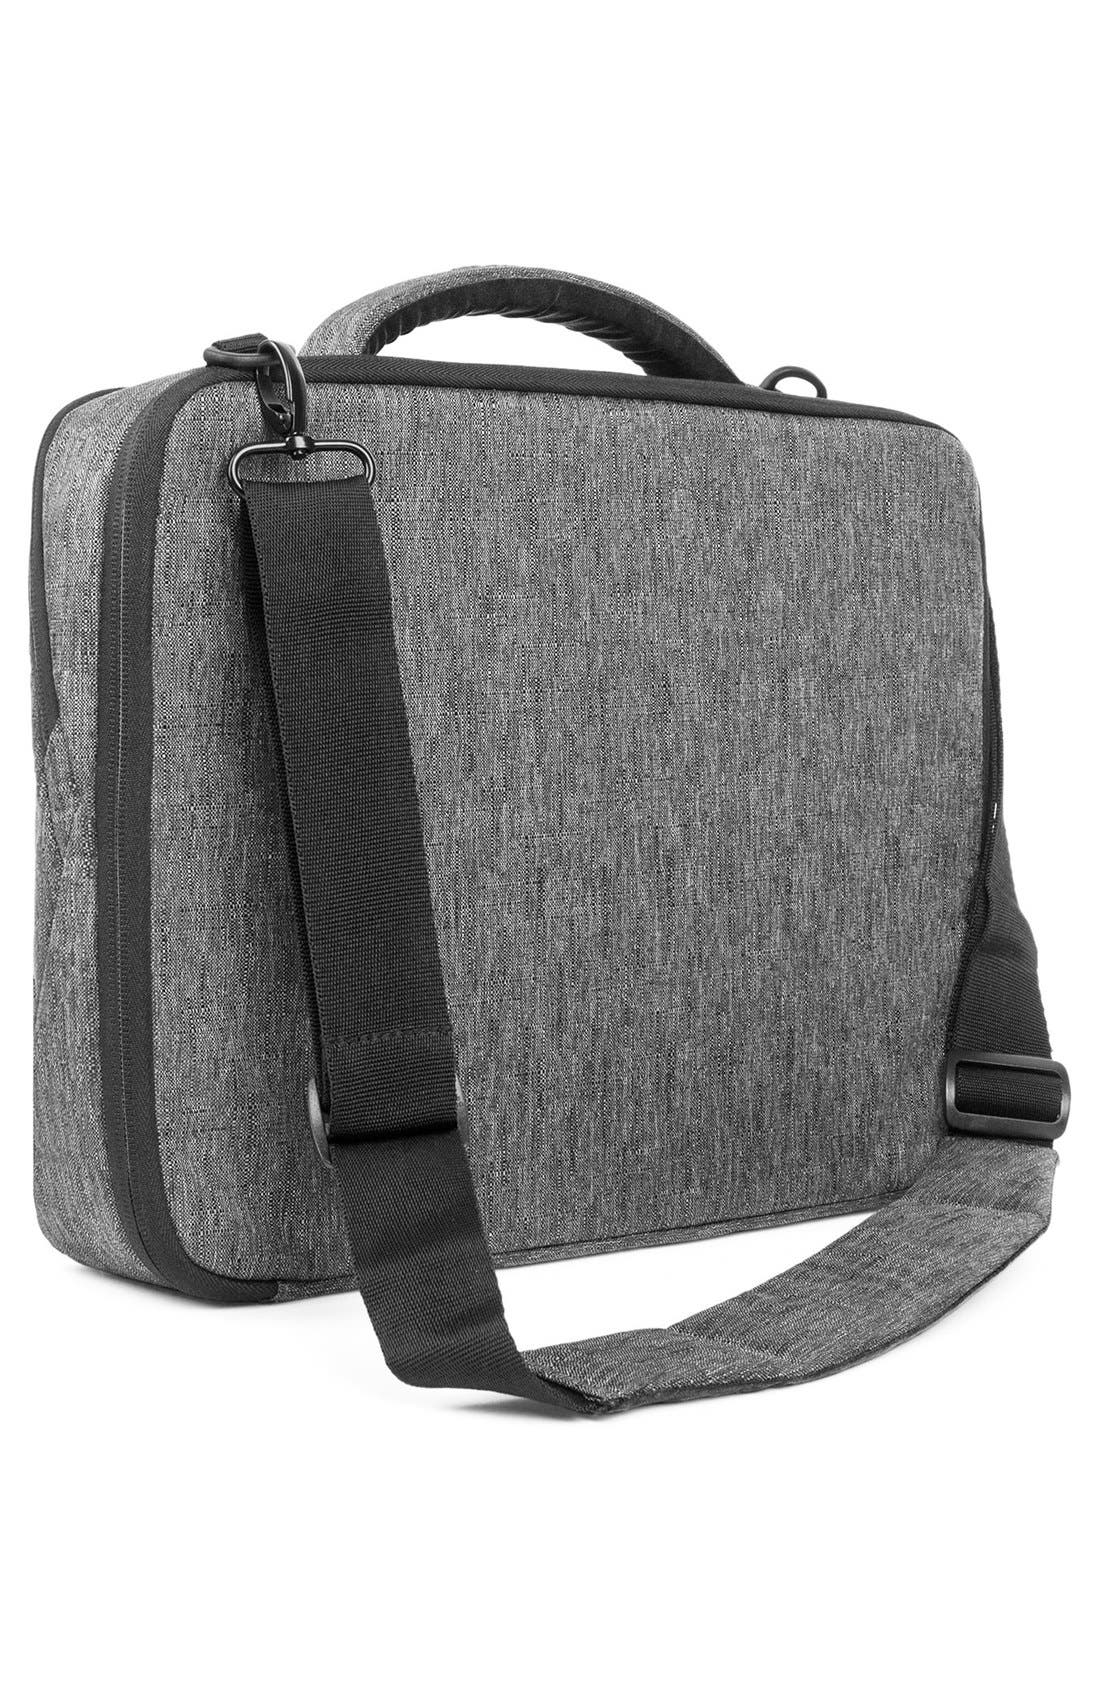 "Alternate Image 3  - Incase Designs 'Reform' 13"" Laptop Briefcase"